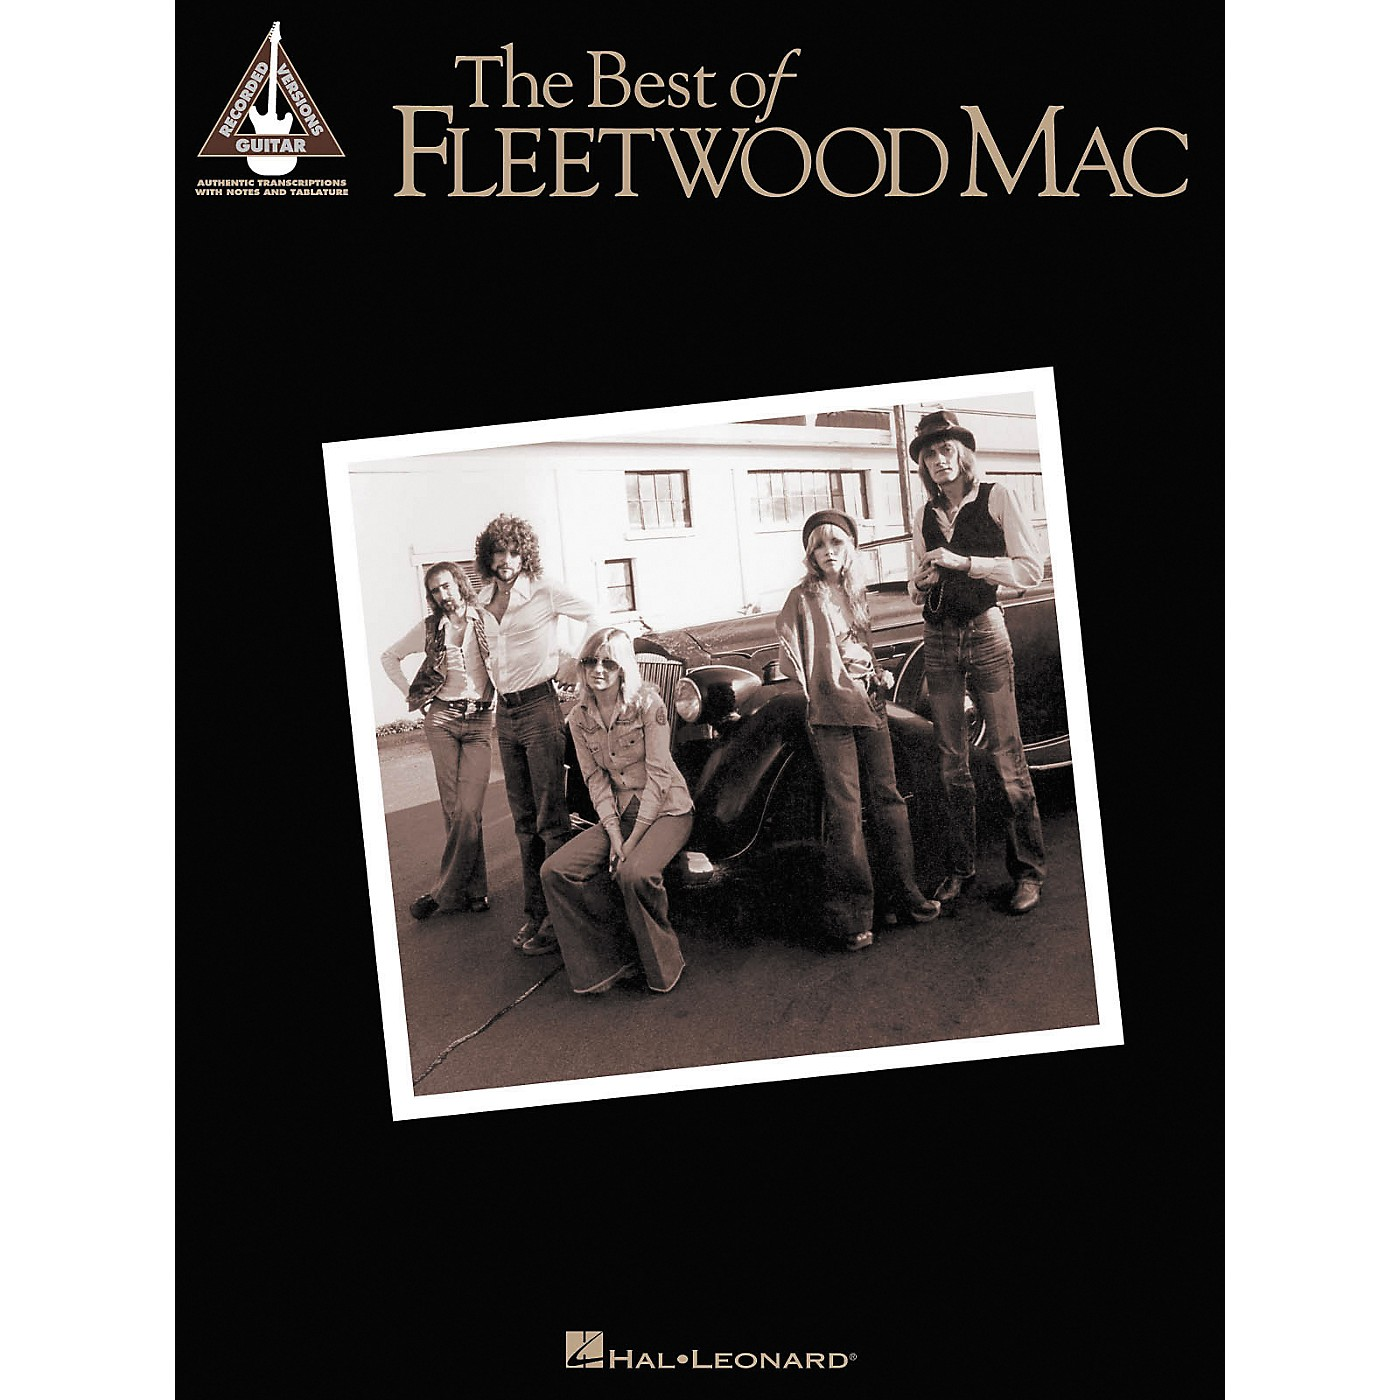 Hal Leonard The Best of Fleetwood Mac Guitar Tab Songbook thumbnail